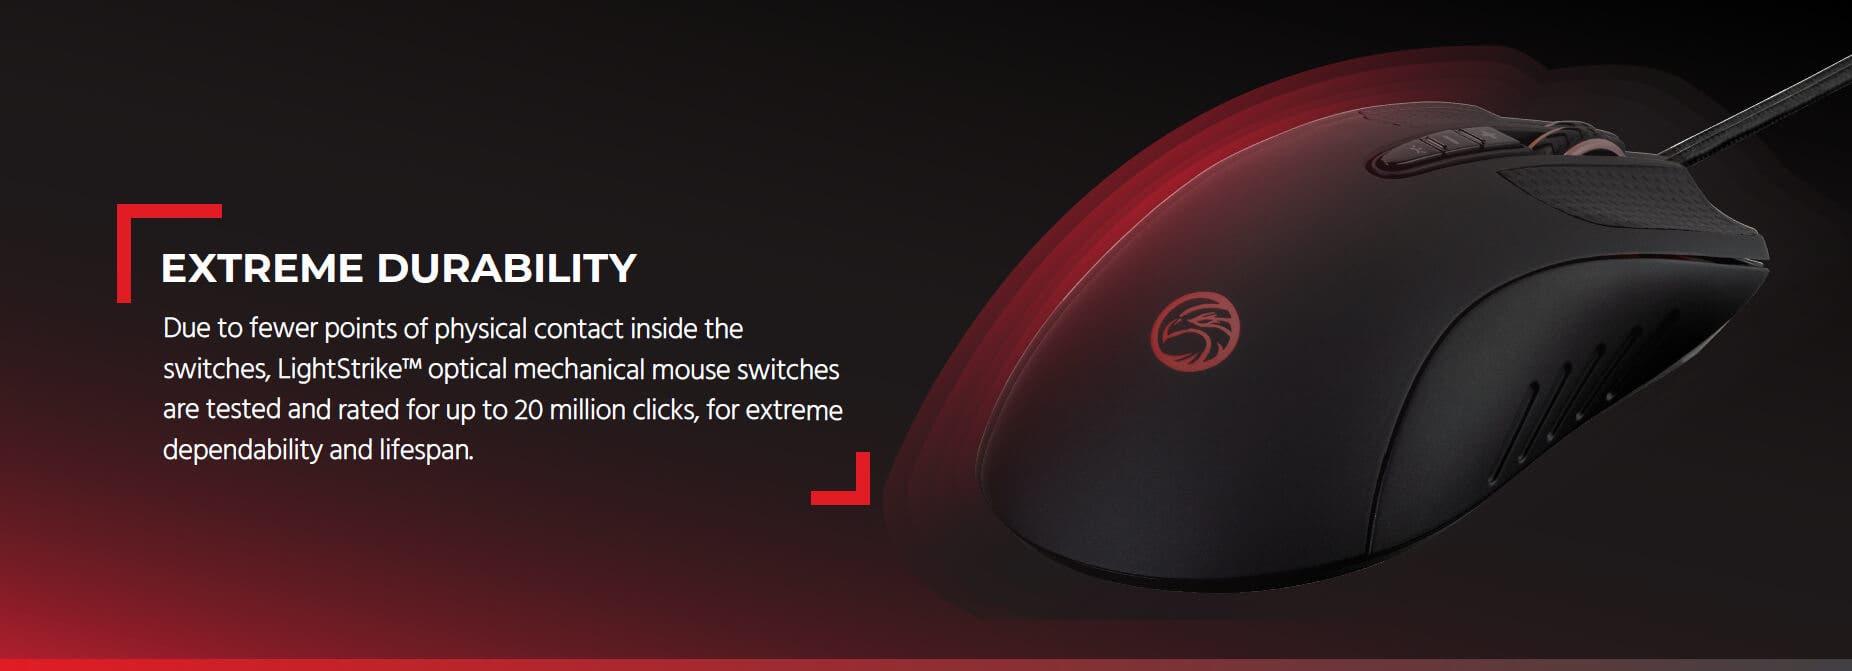 Blackbird Gaming by Monoprice MP90 Laser Gaming Mouse - 12,000DPI